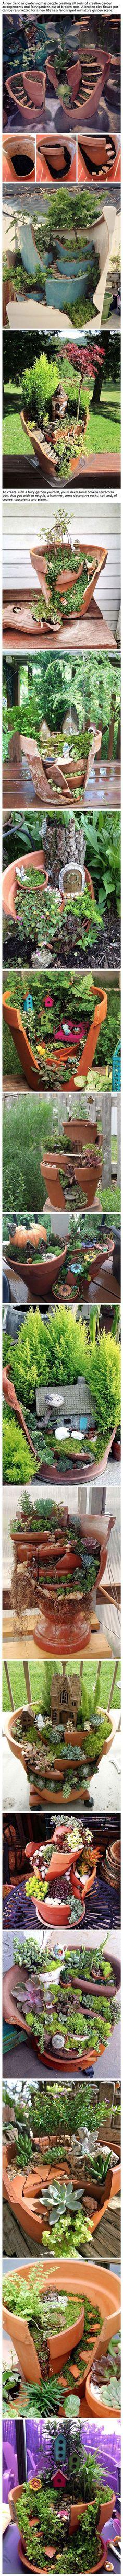 Broken Pots Turned Into Beautiful Fairy Gardens.::